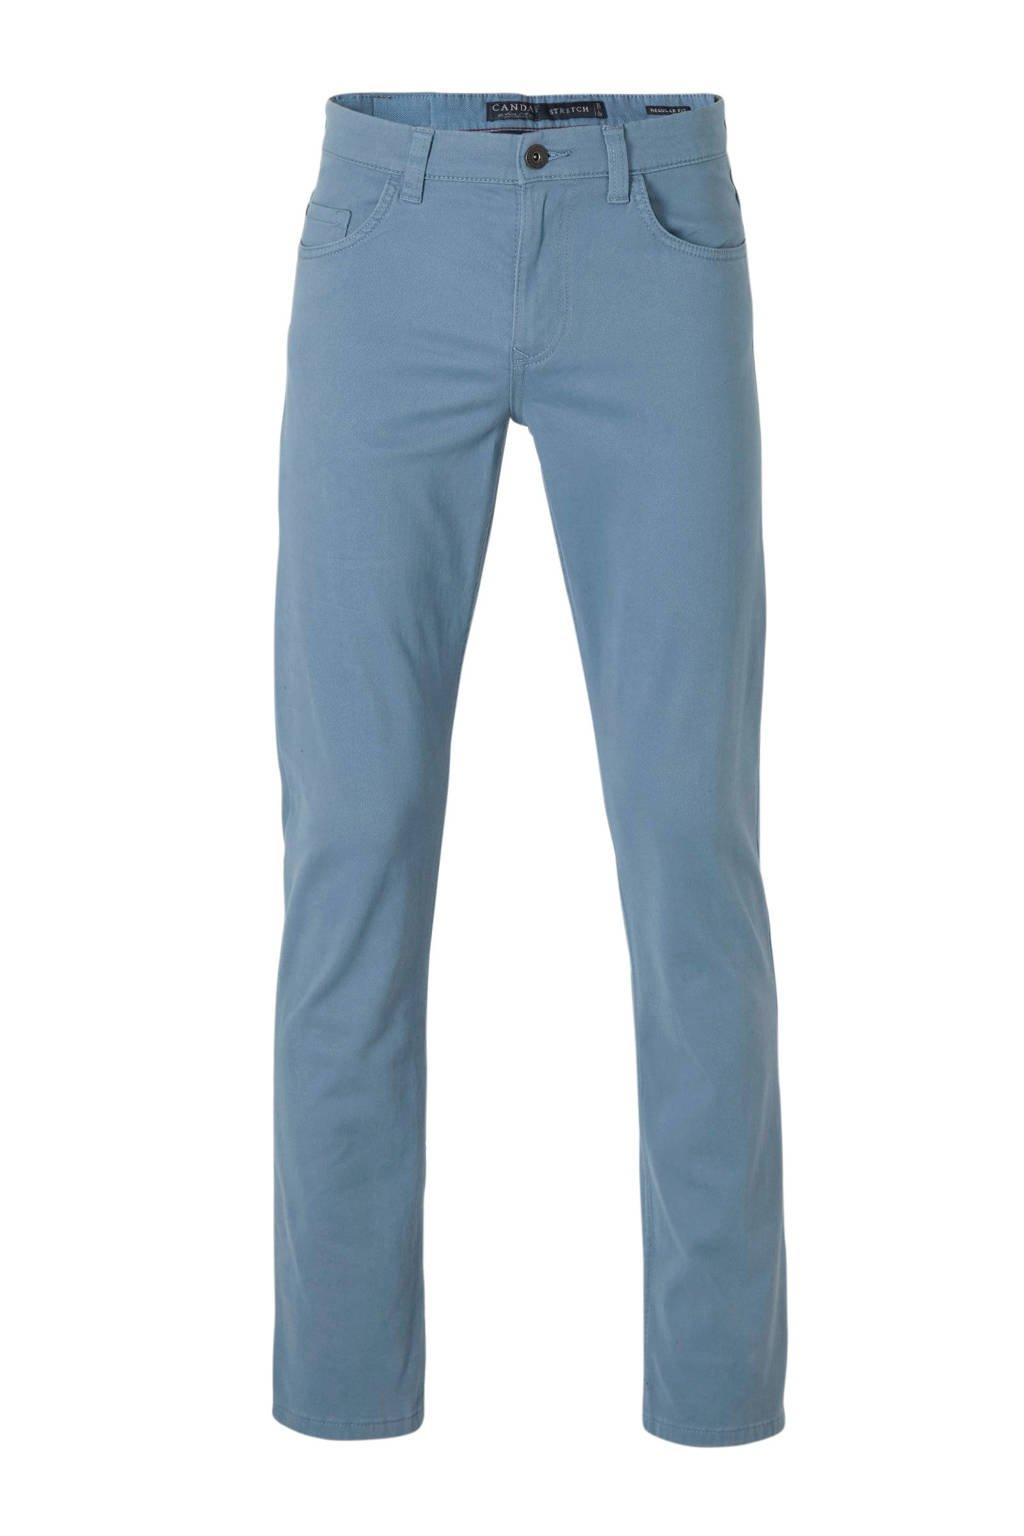 C&A Canda regular fit jeans blauw, Blauw